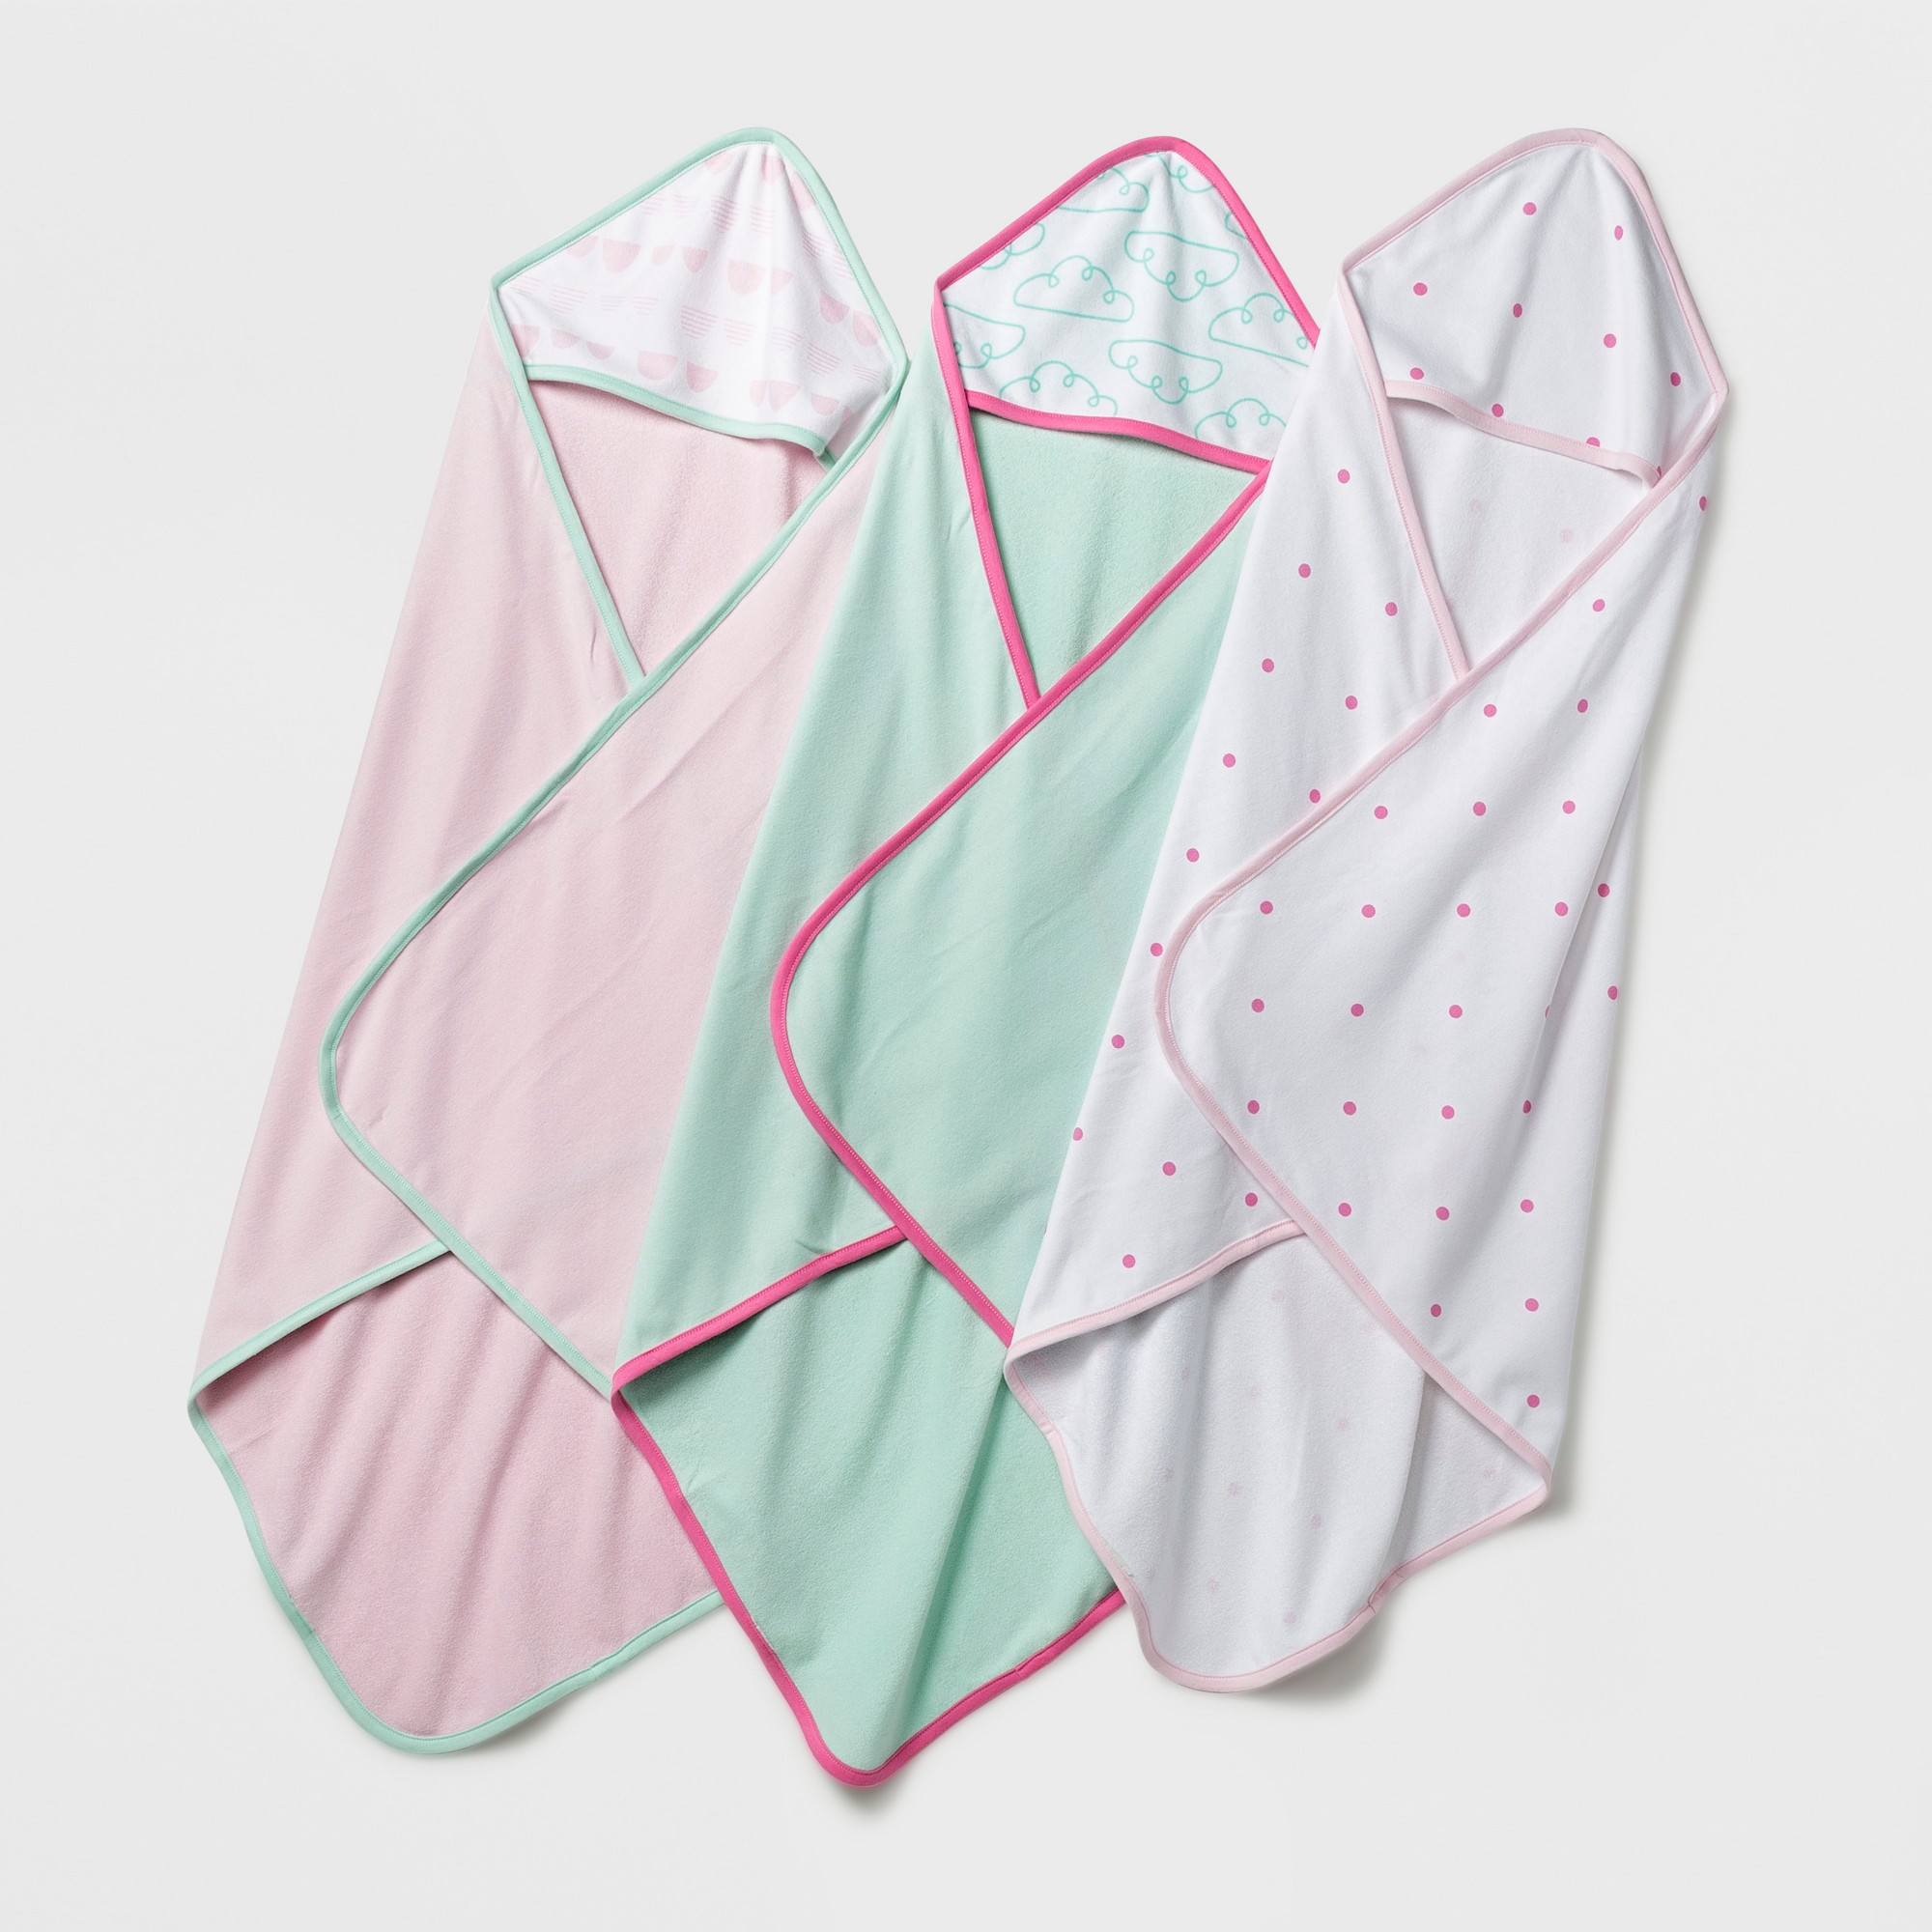 Baby Lightweight 3pk Hooded Towel Set Cloud Island Pink